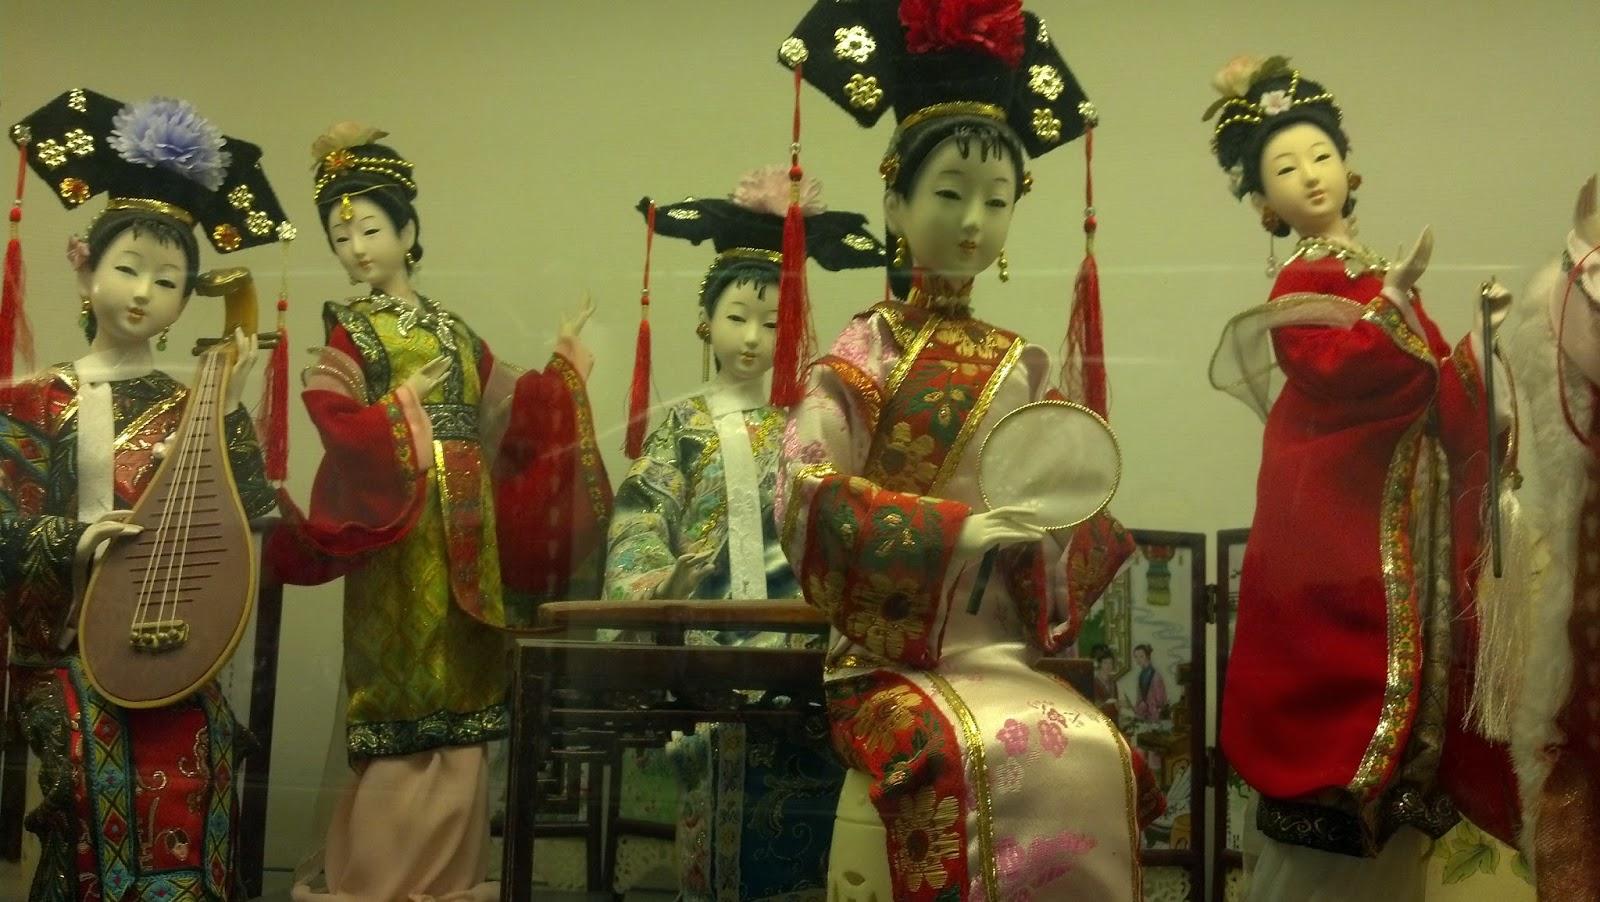 chinese doll,peluangtercipta,peluang tercipta,peluang pekerjaan